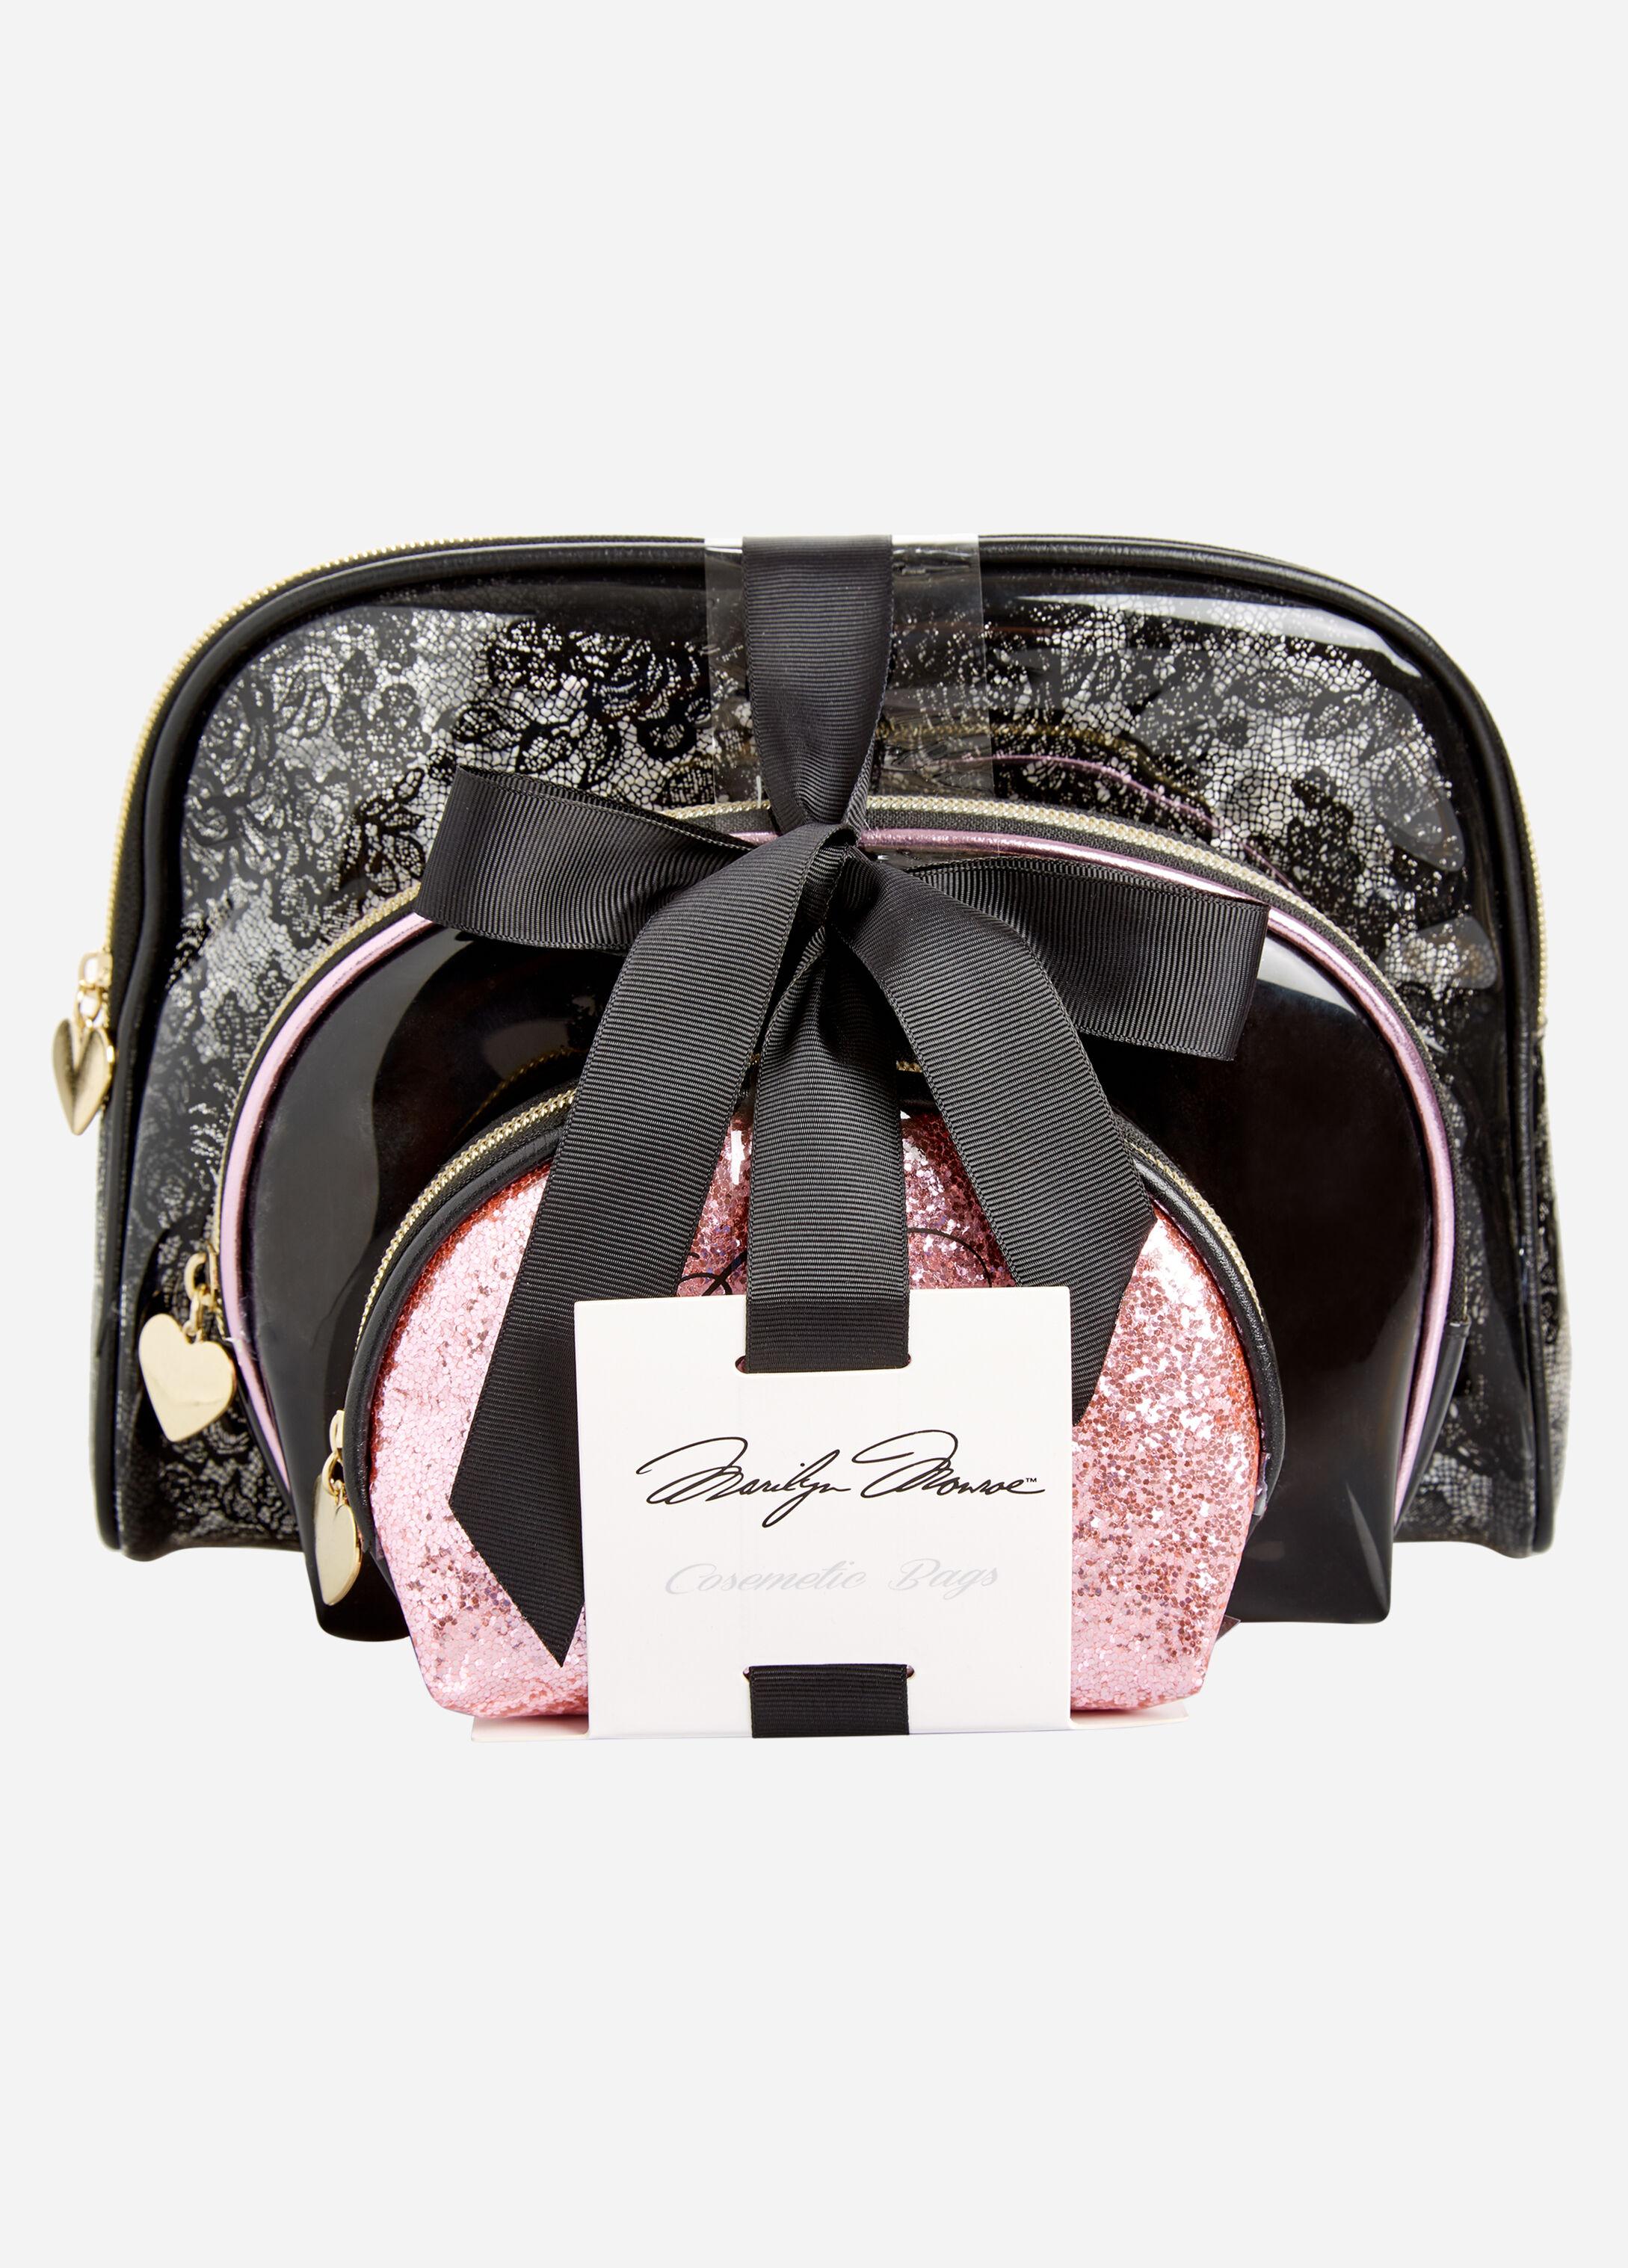 Marilyn Monroe 3-Piece Cosmetic Bag Set